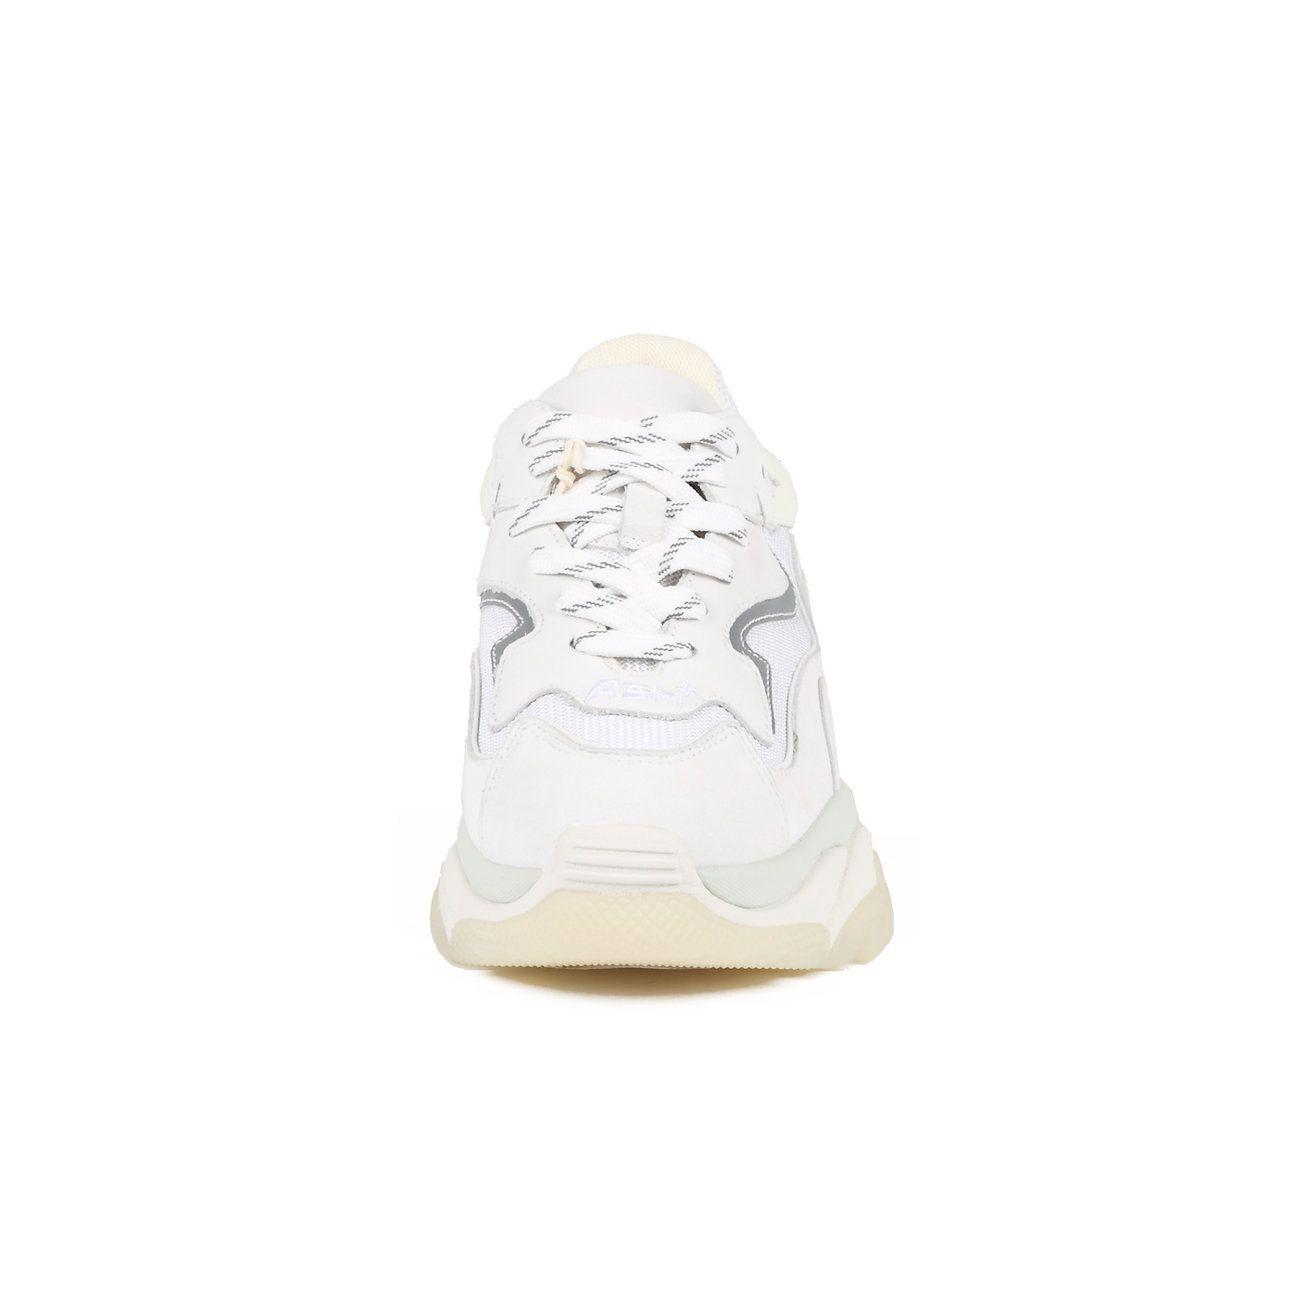 NIB ASH Women/'s Addict Bis Sneakers White Auth 36 37 38 39 40